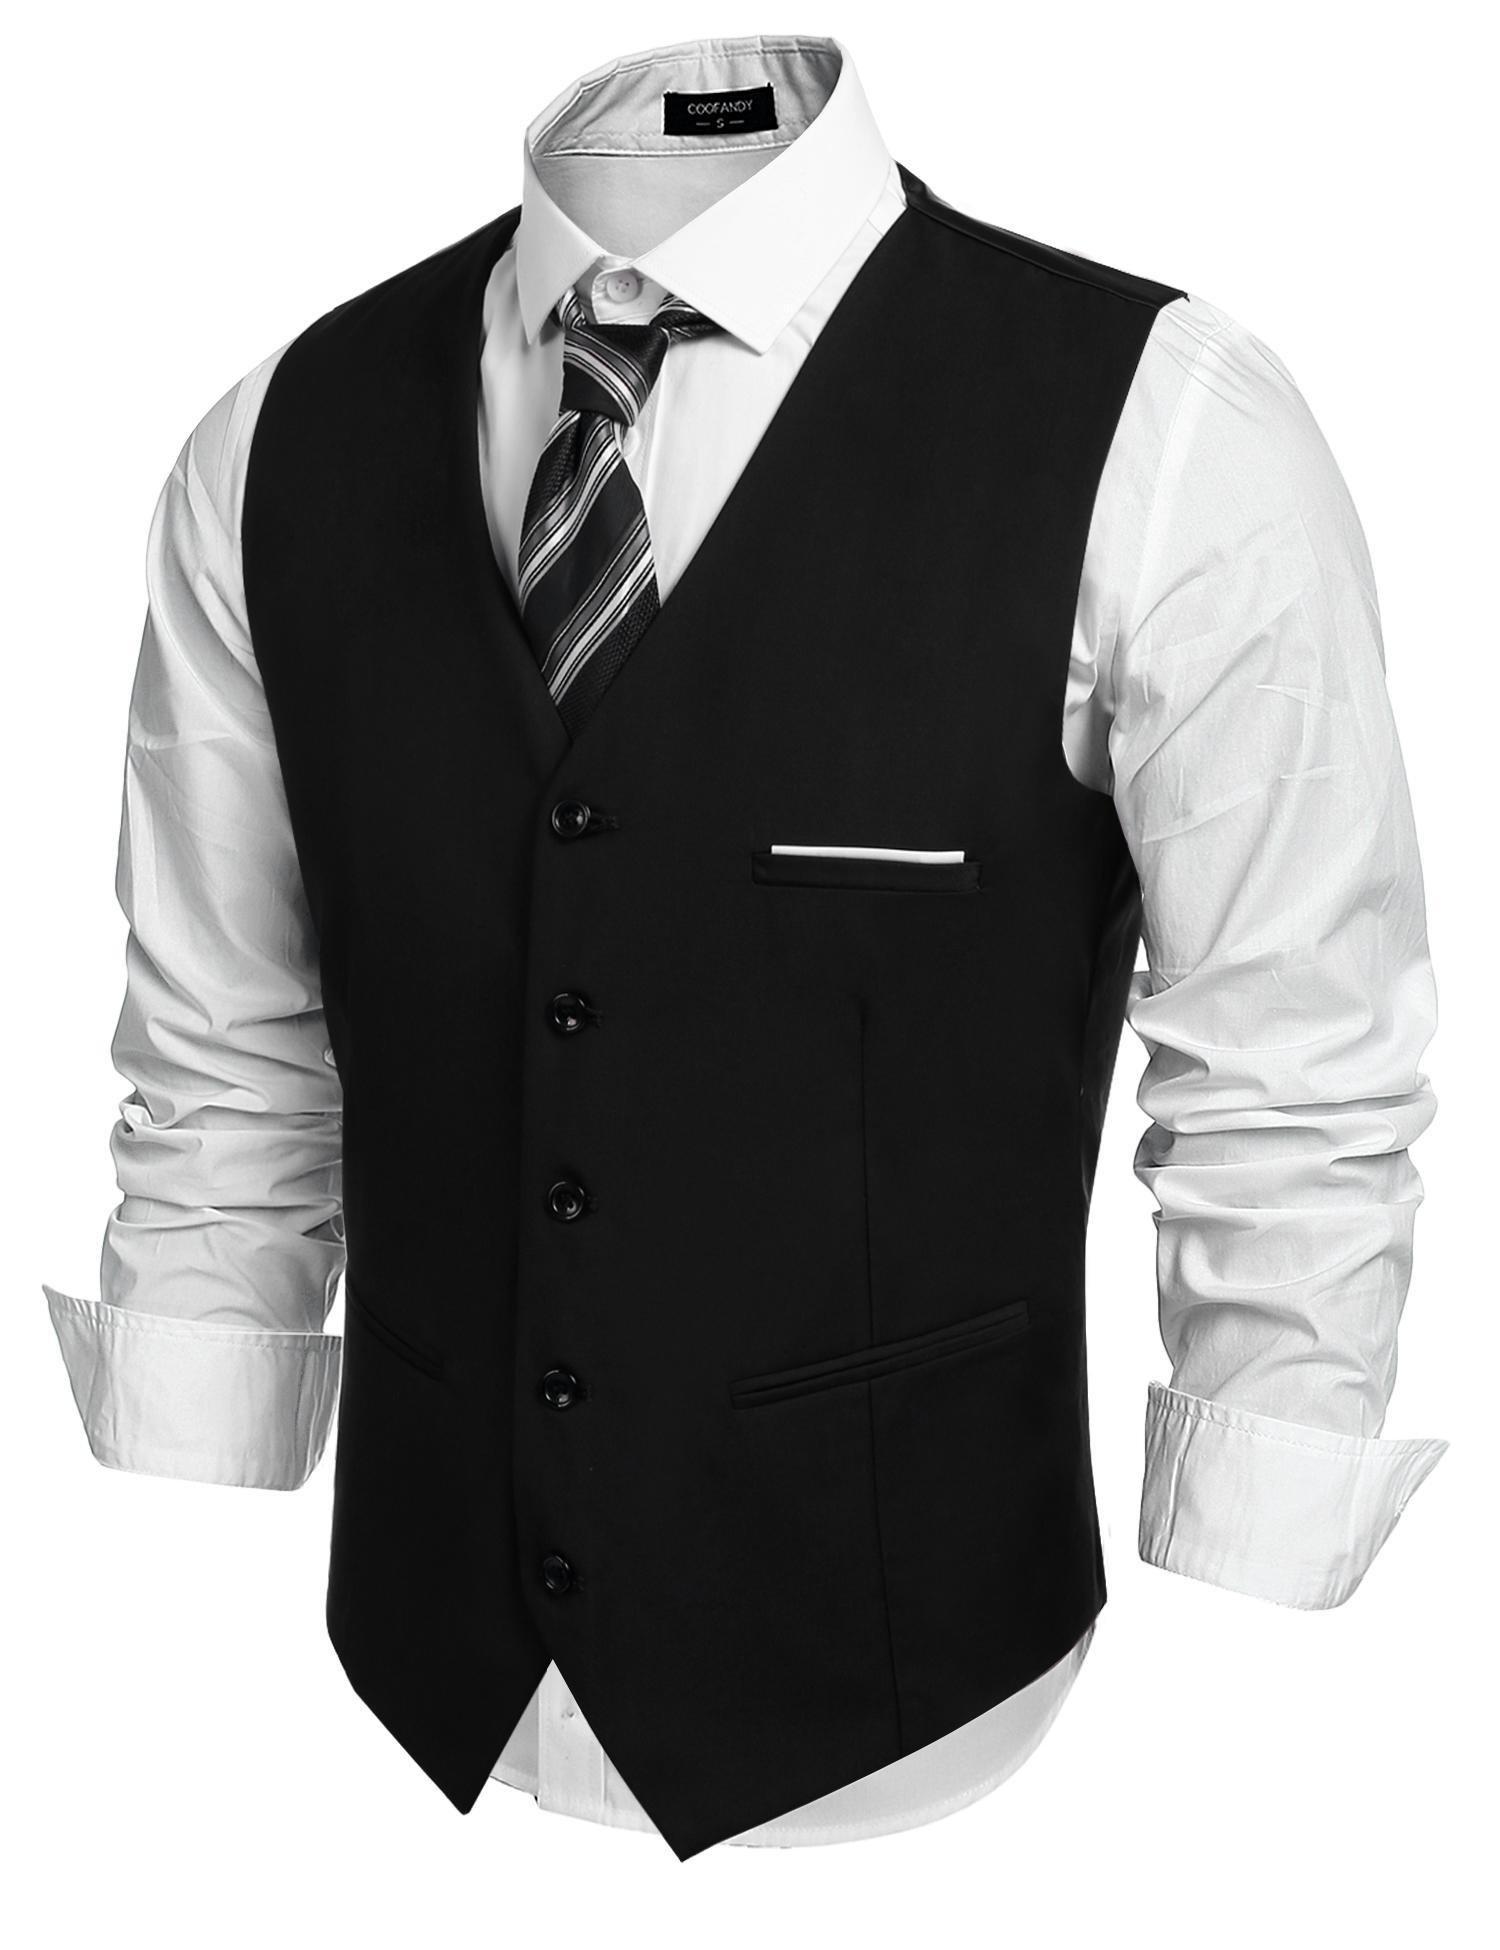 COOFANDY Men's Fashion Formal Slim Fit Business Dress Suit Vest Waistcoat Black by COOFANDY